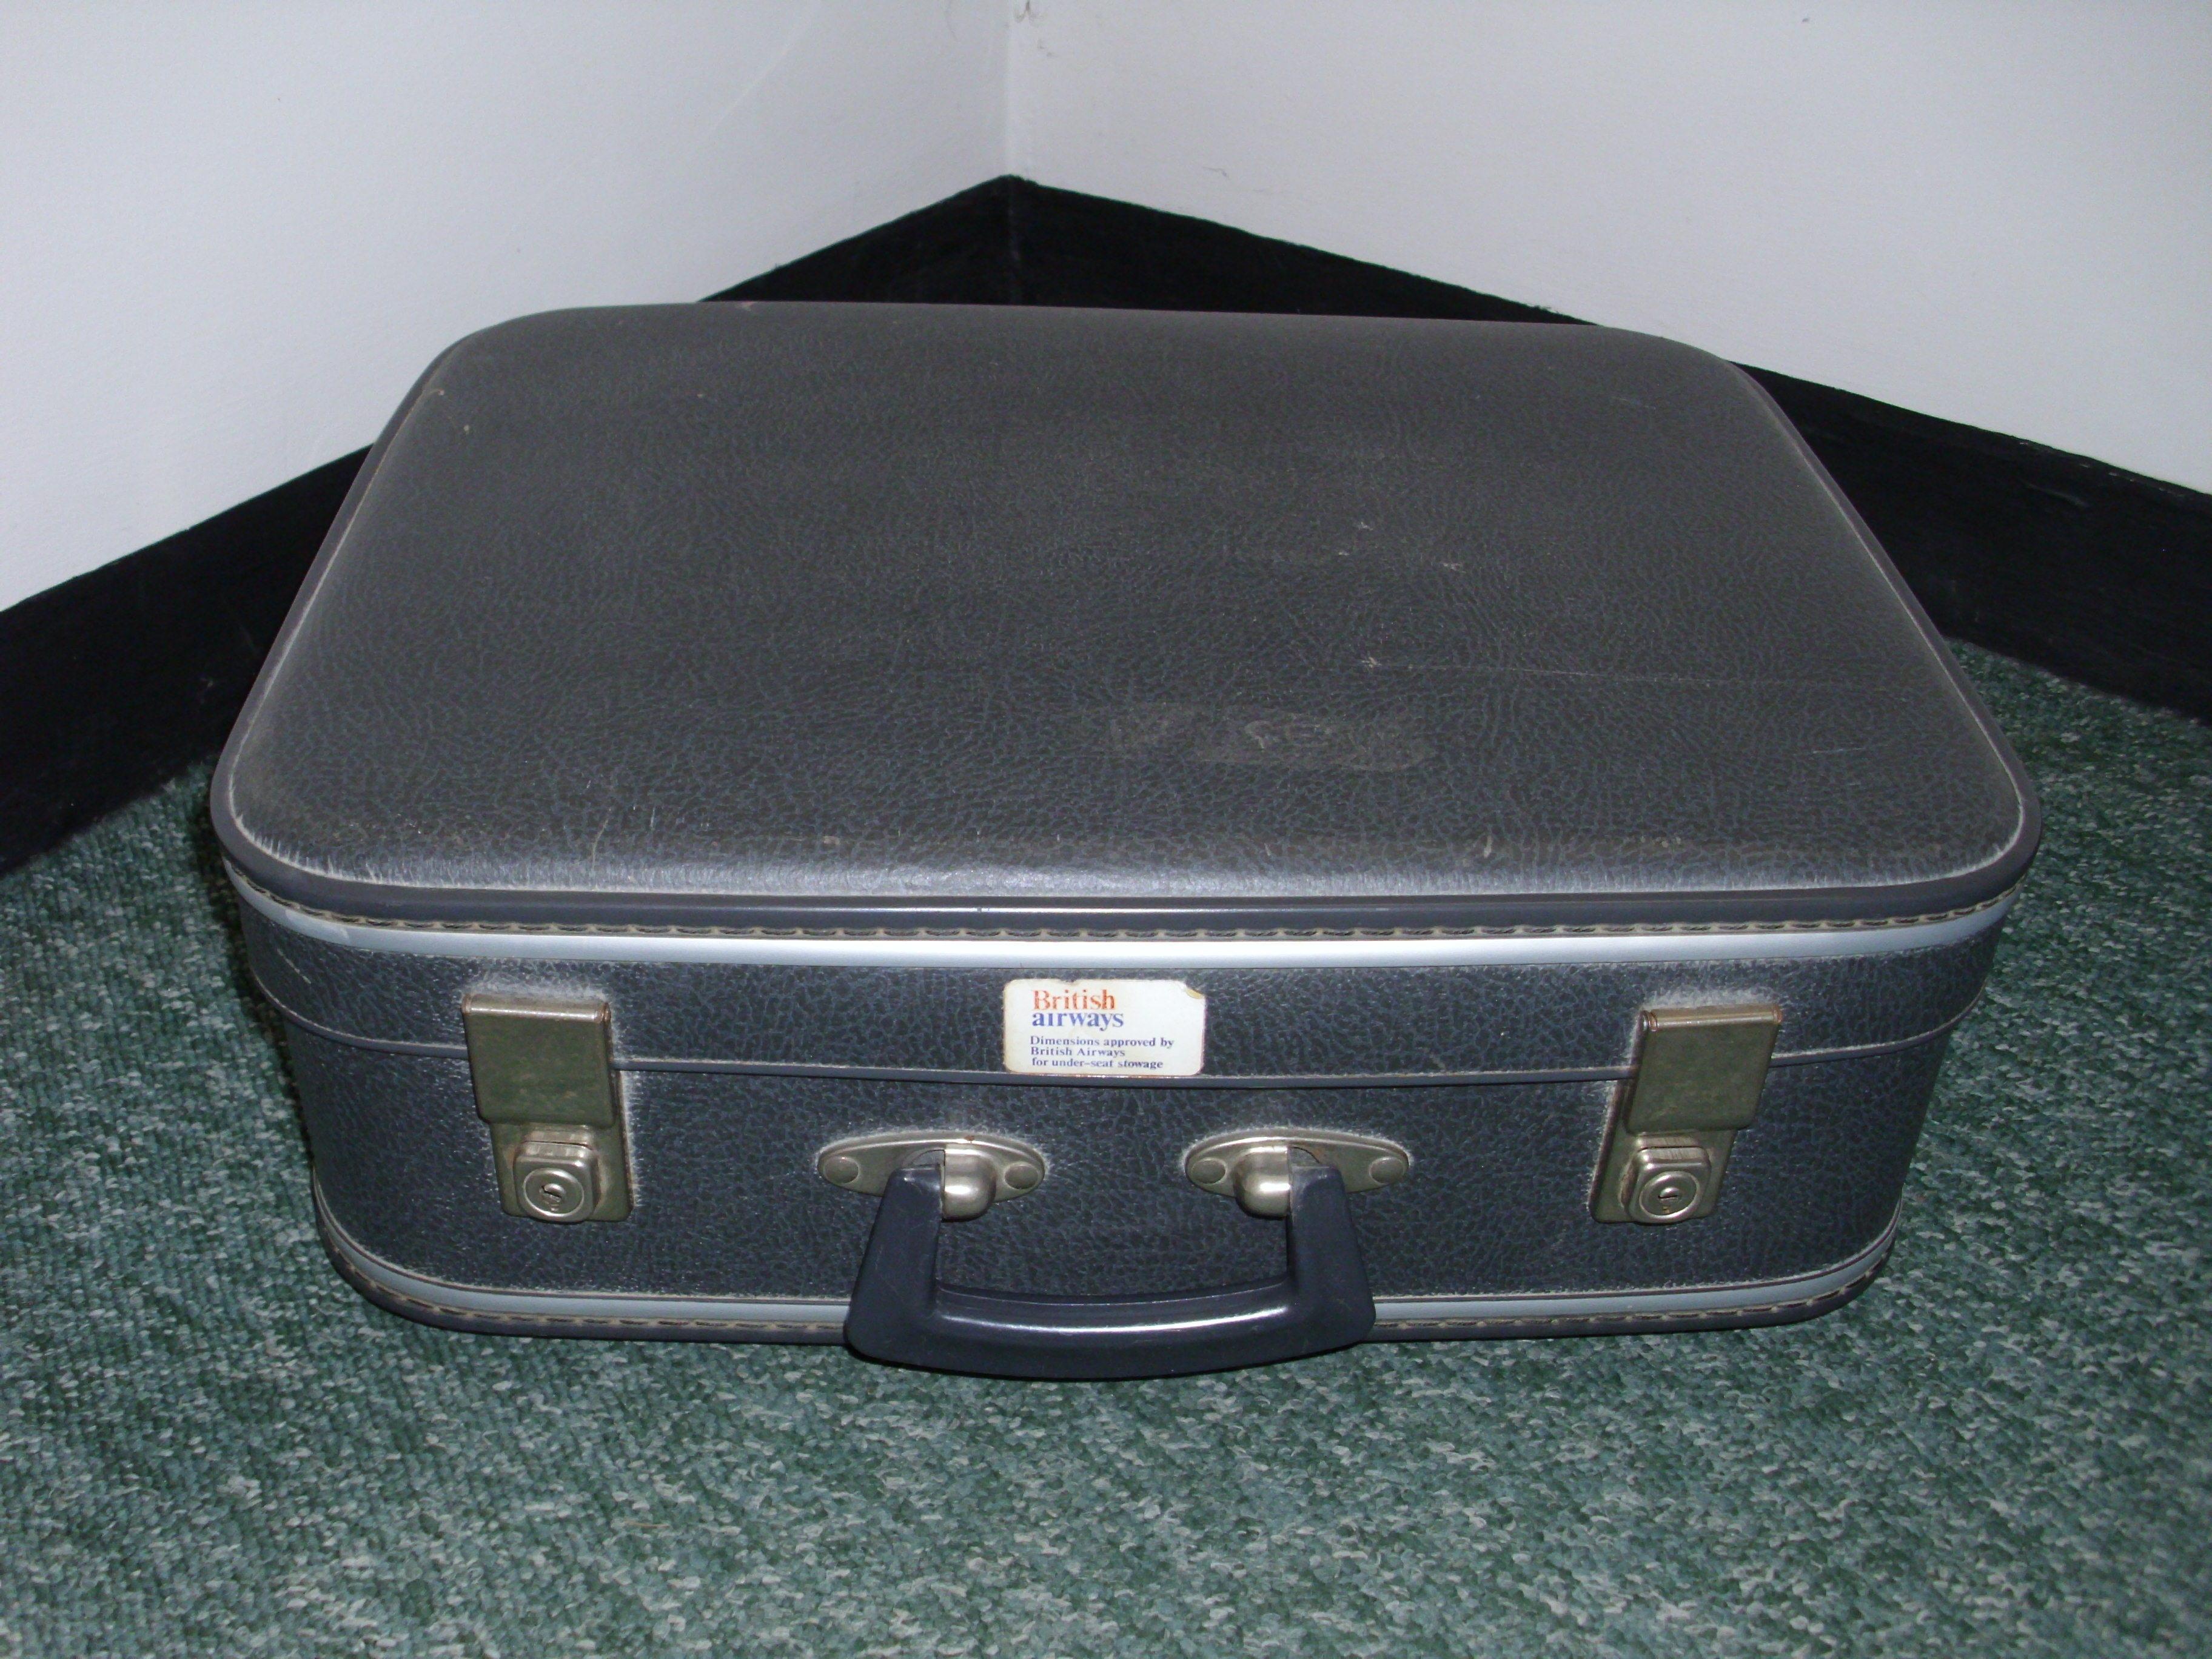 Grey Hard Shell Suitcase - 35cm x 45cm x 15cm - Used/good